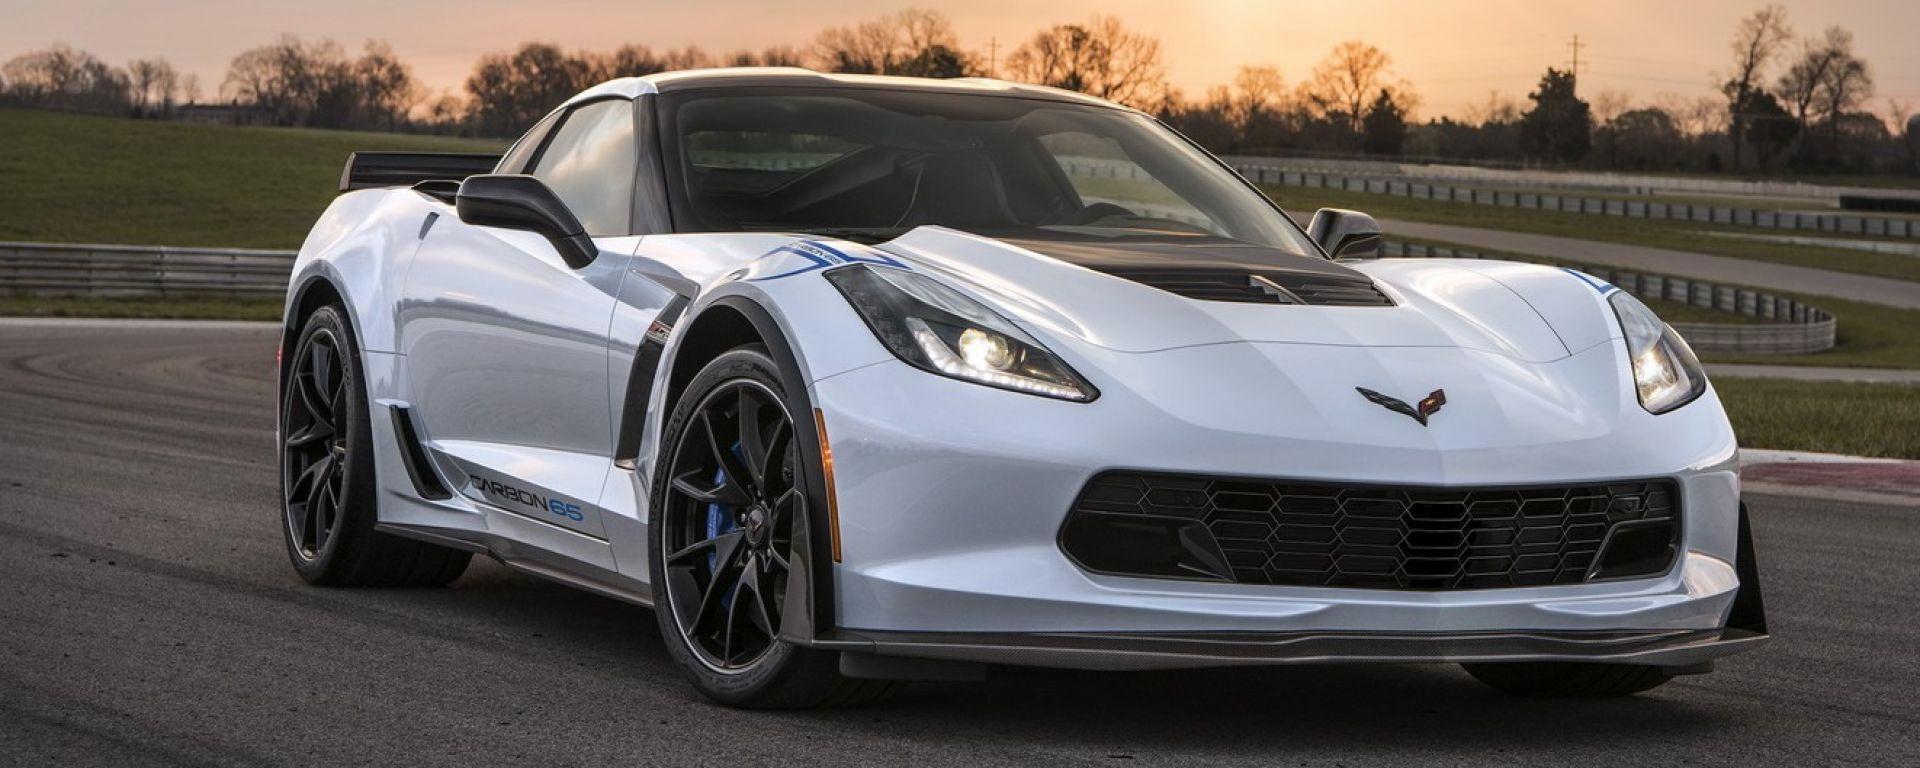 Chevrolet Corvette Carbon 65 Edition: un kit per il compleanno